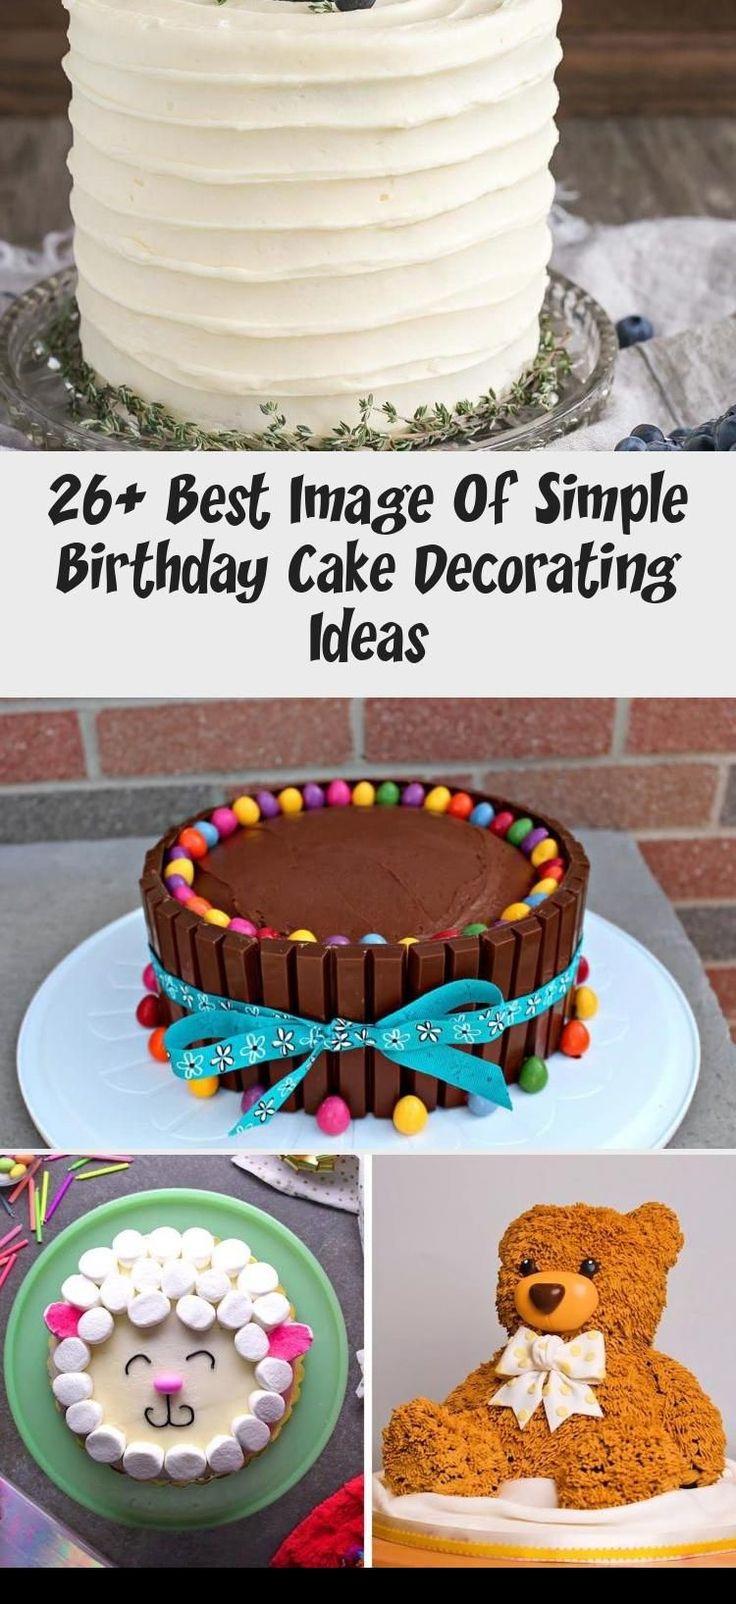 26+ Best Image Of Simple Birthday Cake Decorating Ideas